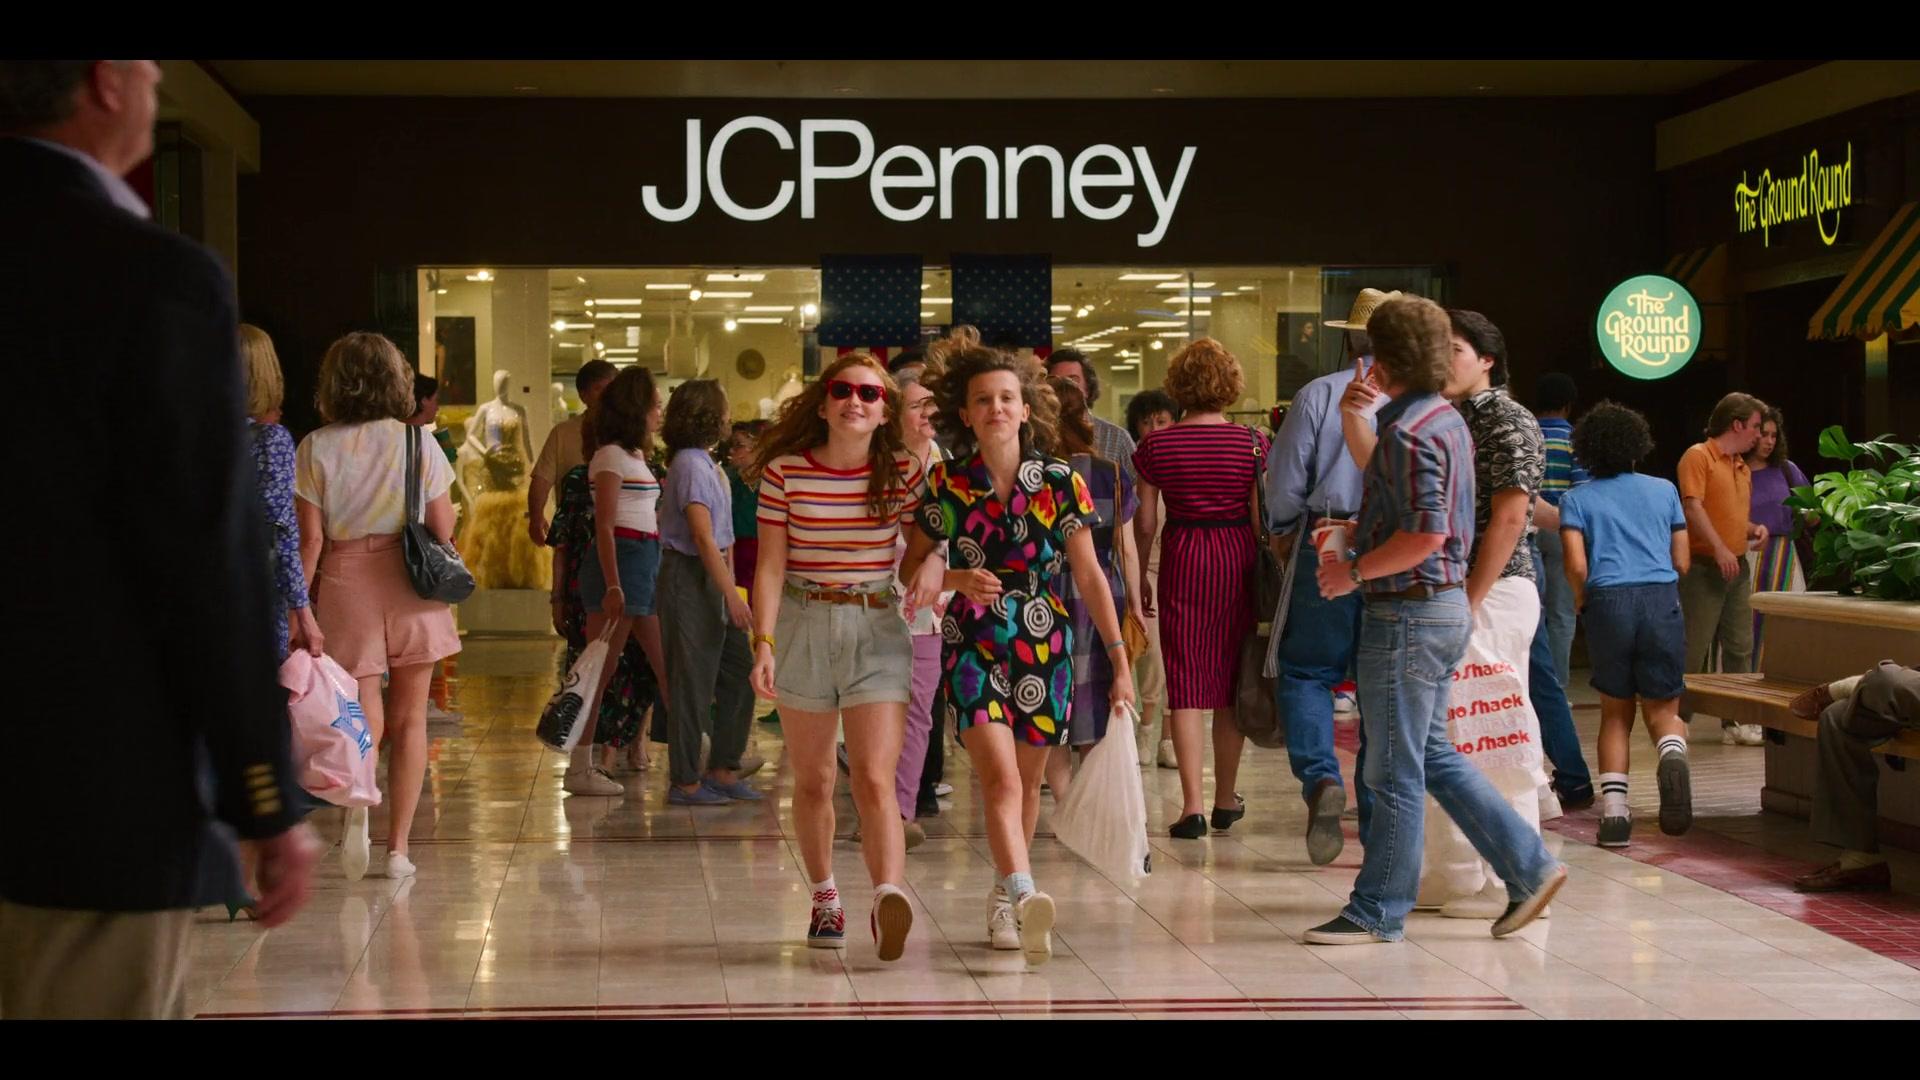 JCPenney Store in Stranger Things - Season 3, Episode 2,